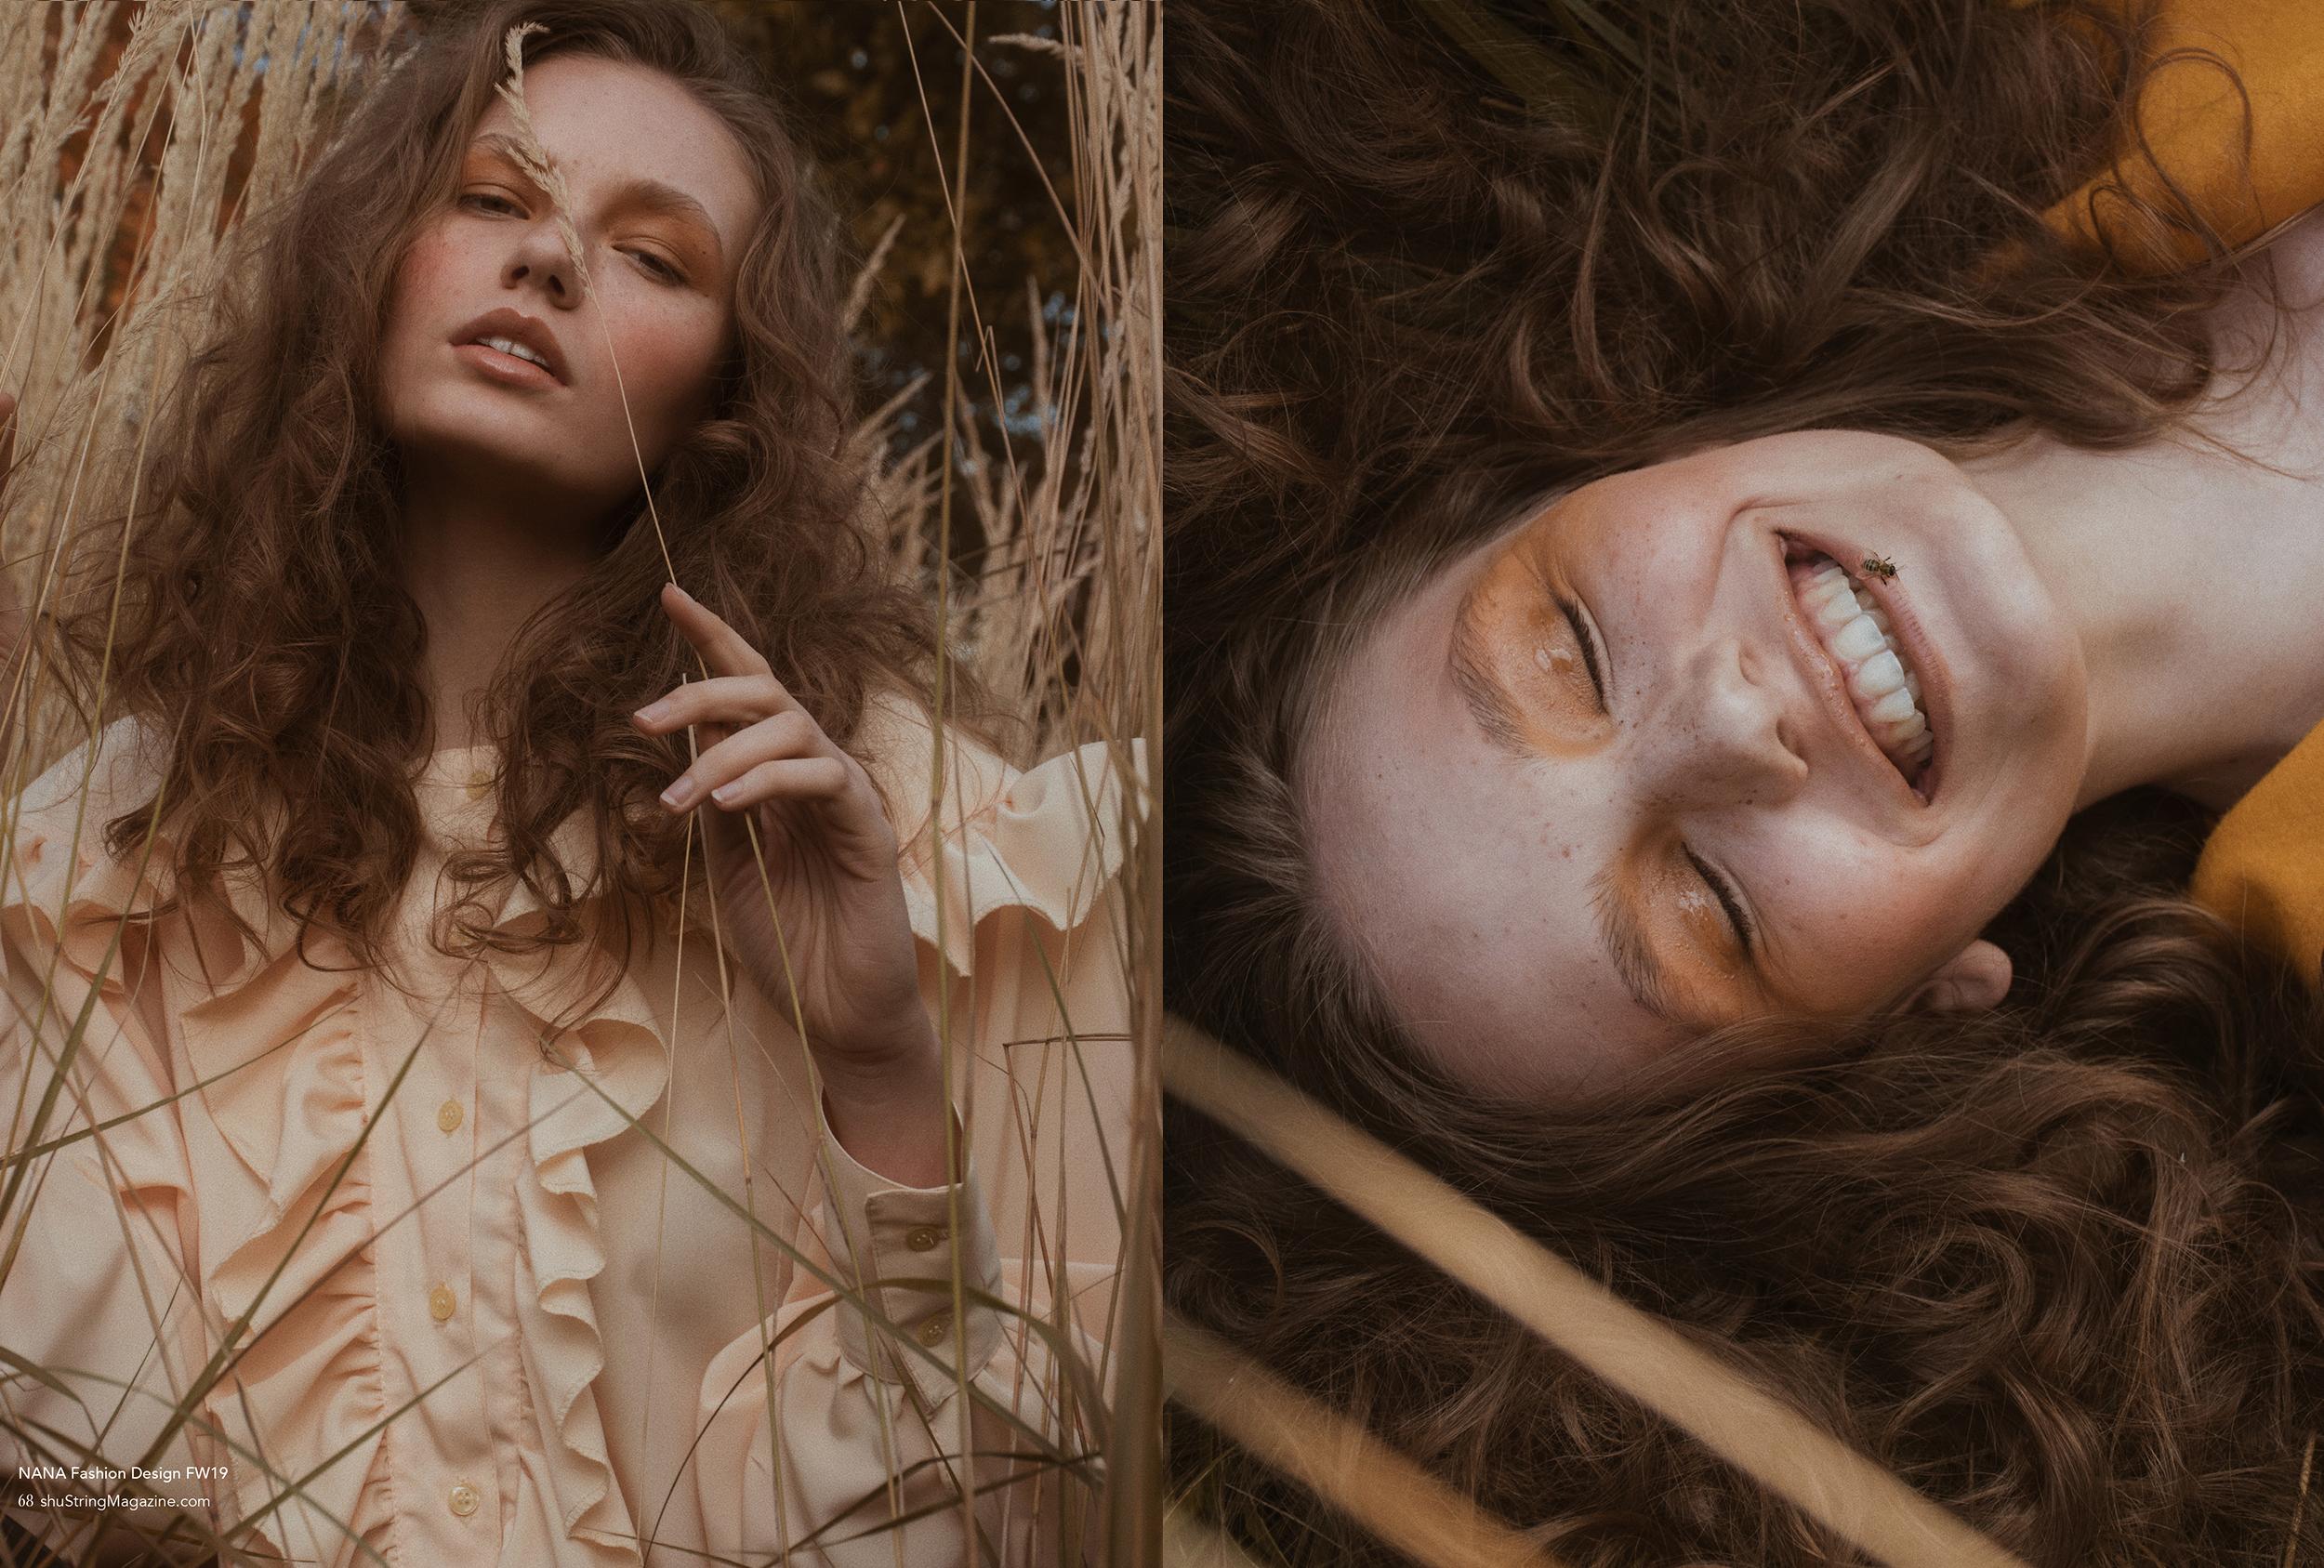 Honeycomb Child Shustring Magazine stefan kokovic vienna photographer photo studio 1010